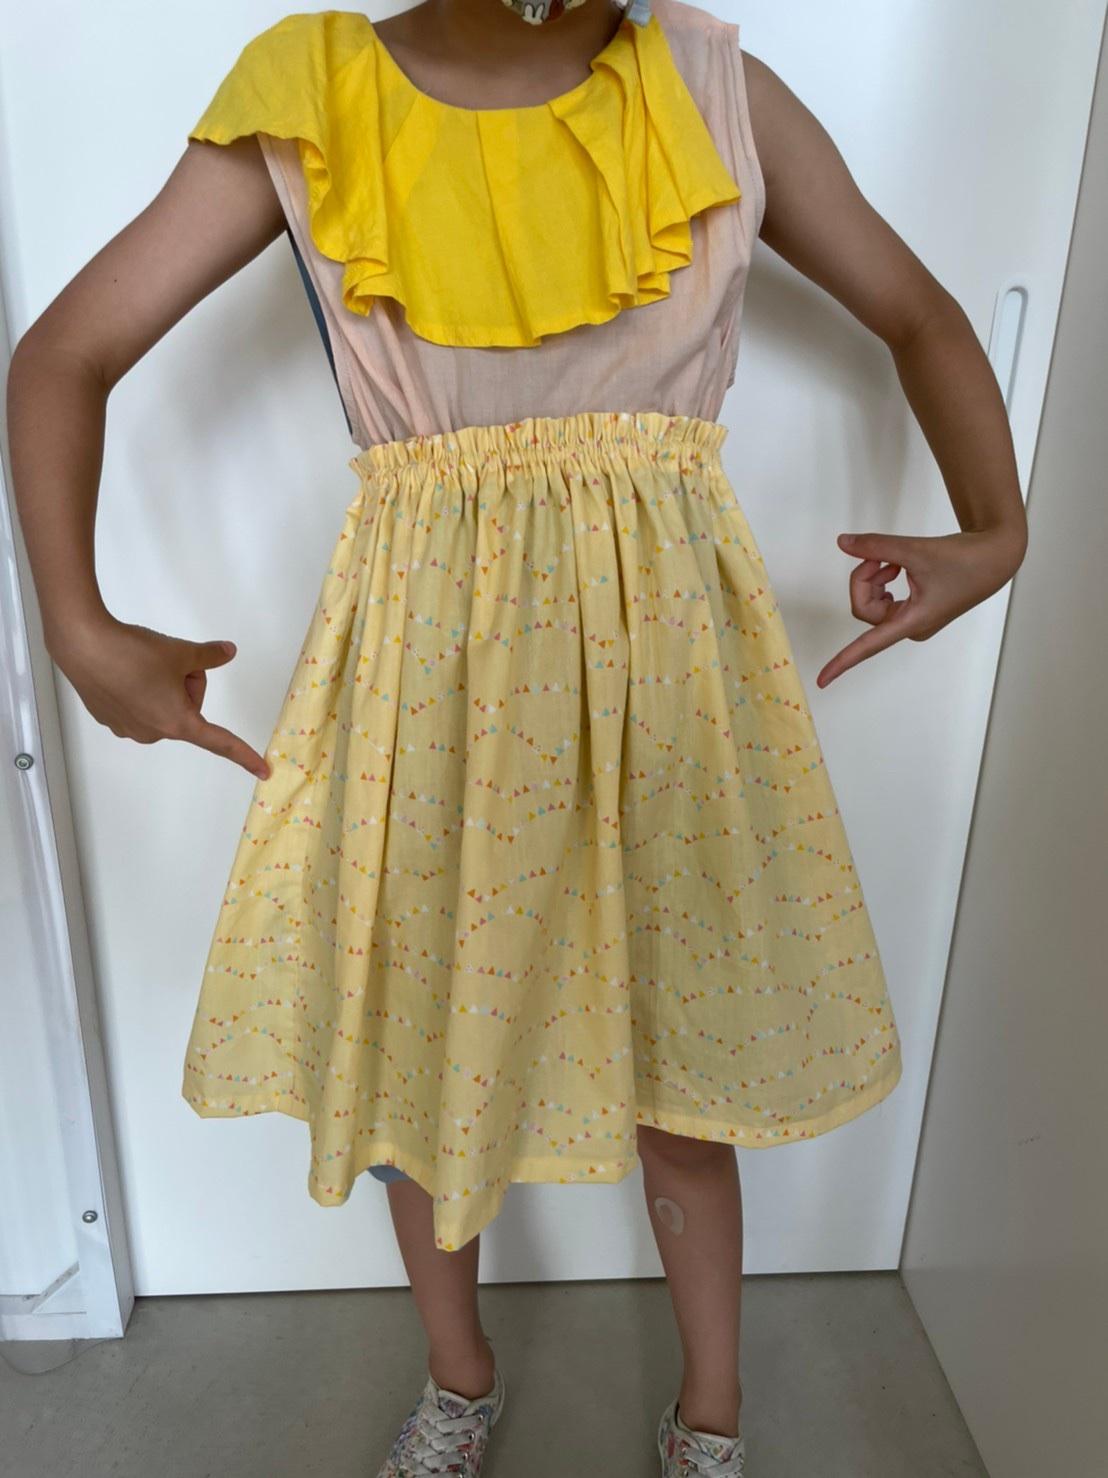 自由研究スカート作り完成図